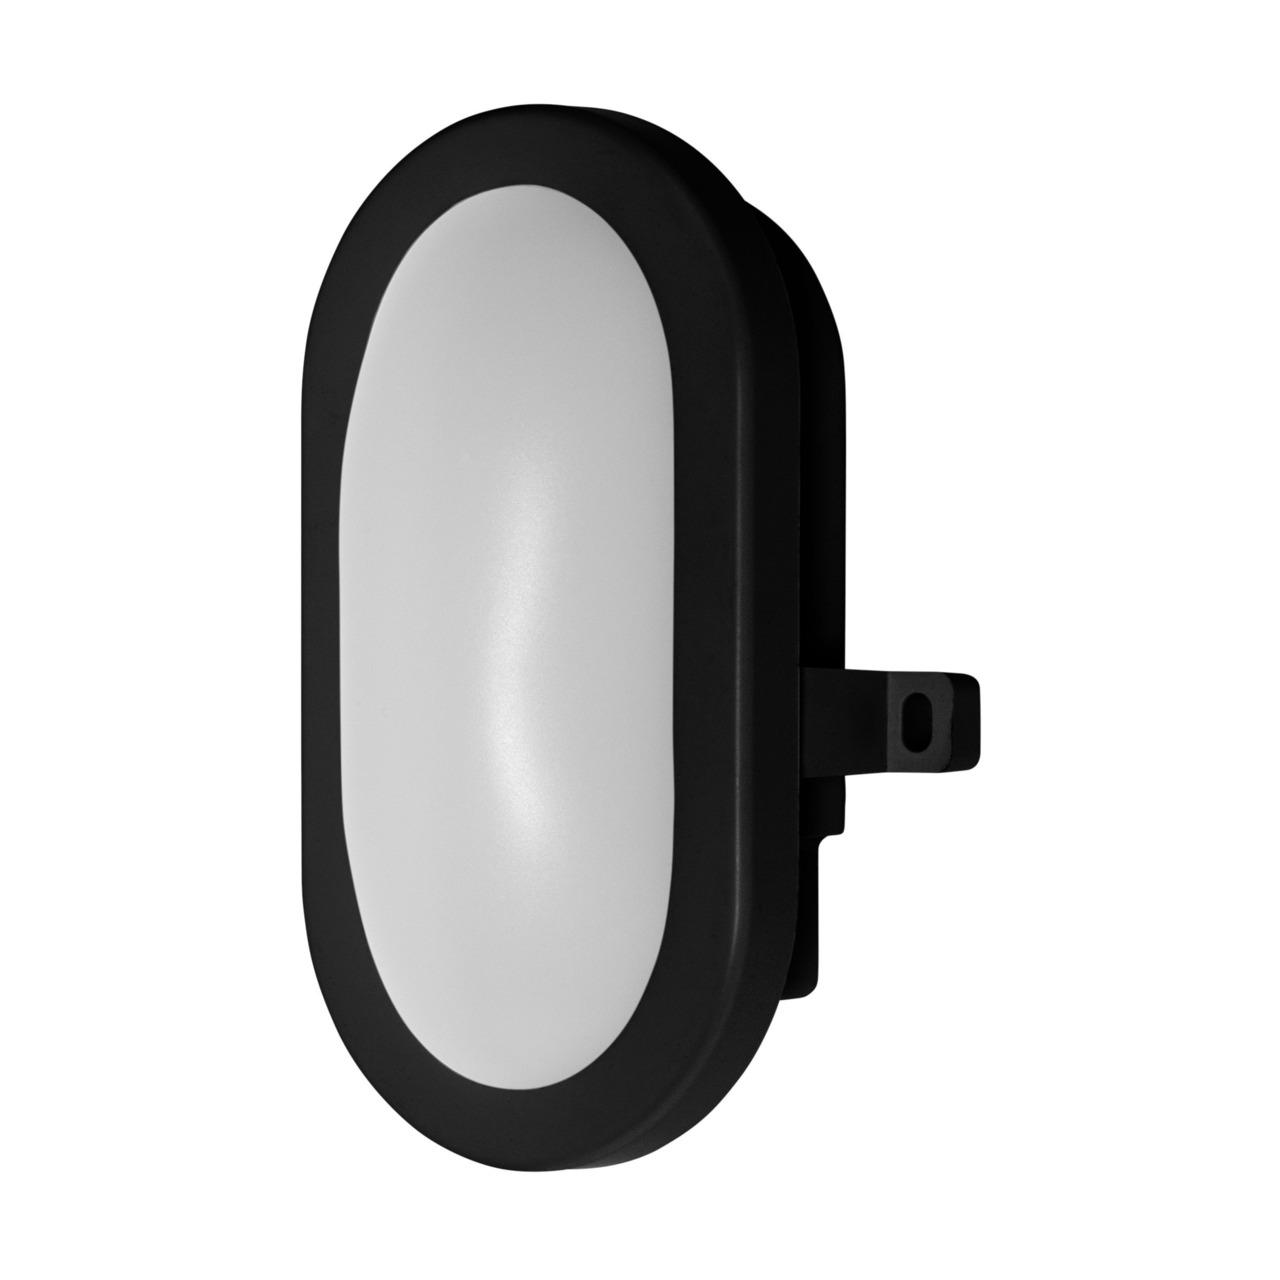 Ledvance 5-5-W-Wand-Deckenleuchte BULKHEAD- schwarz- 450 lm- kaltweiss- IP54